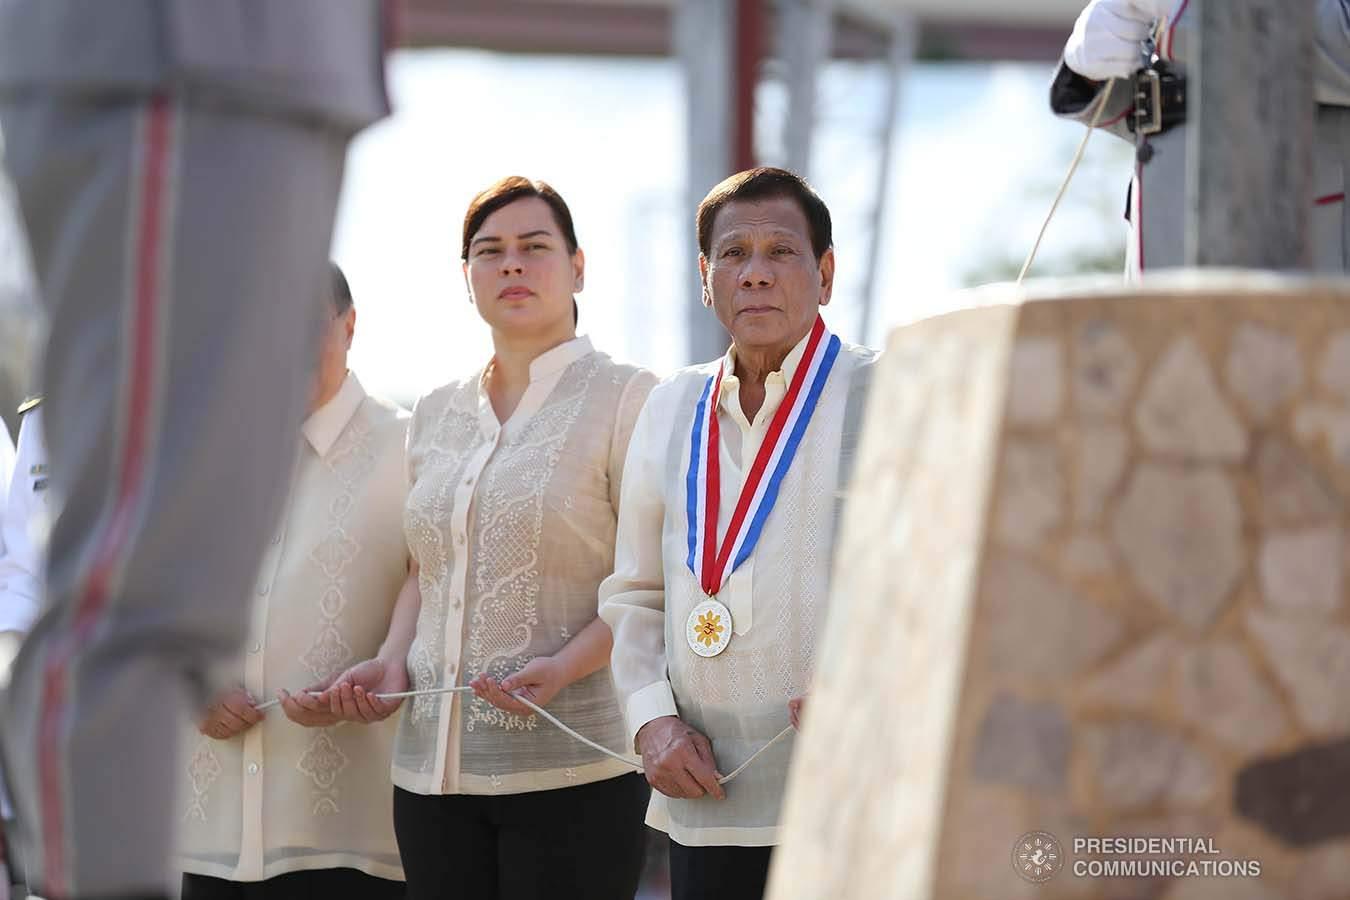 President Rodrigo Duterte leads a flag-raising ceremony with his daughter, Davao City Mayor Sara Duterte-Carpio, in Davao City, 30 December 2019 (Karl Norman Alonzo/Presidential Communications Operations Office)